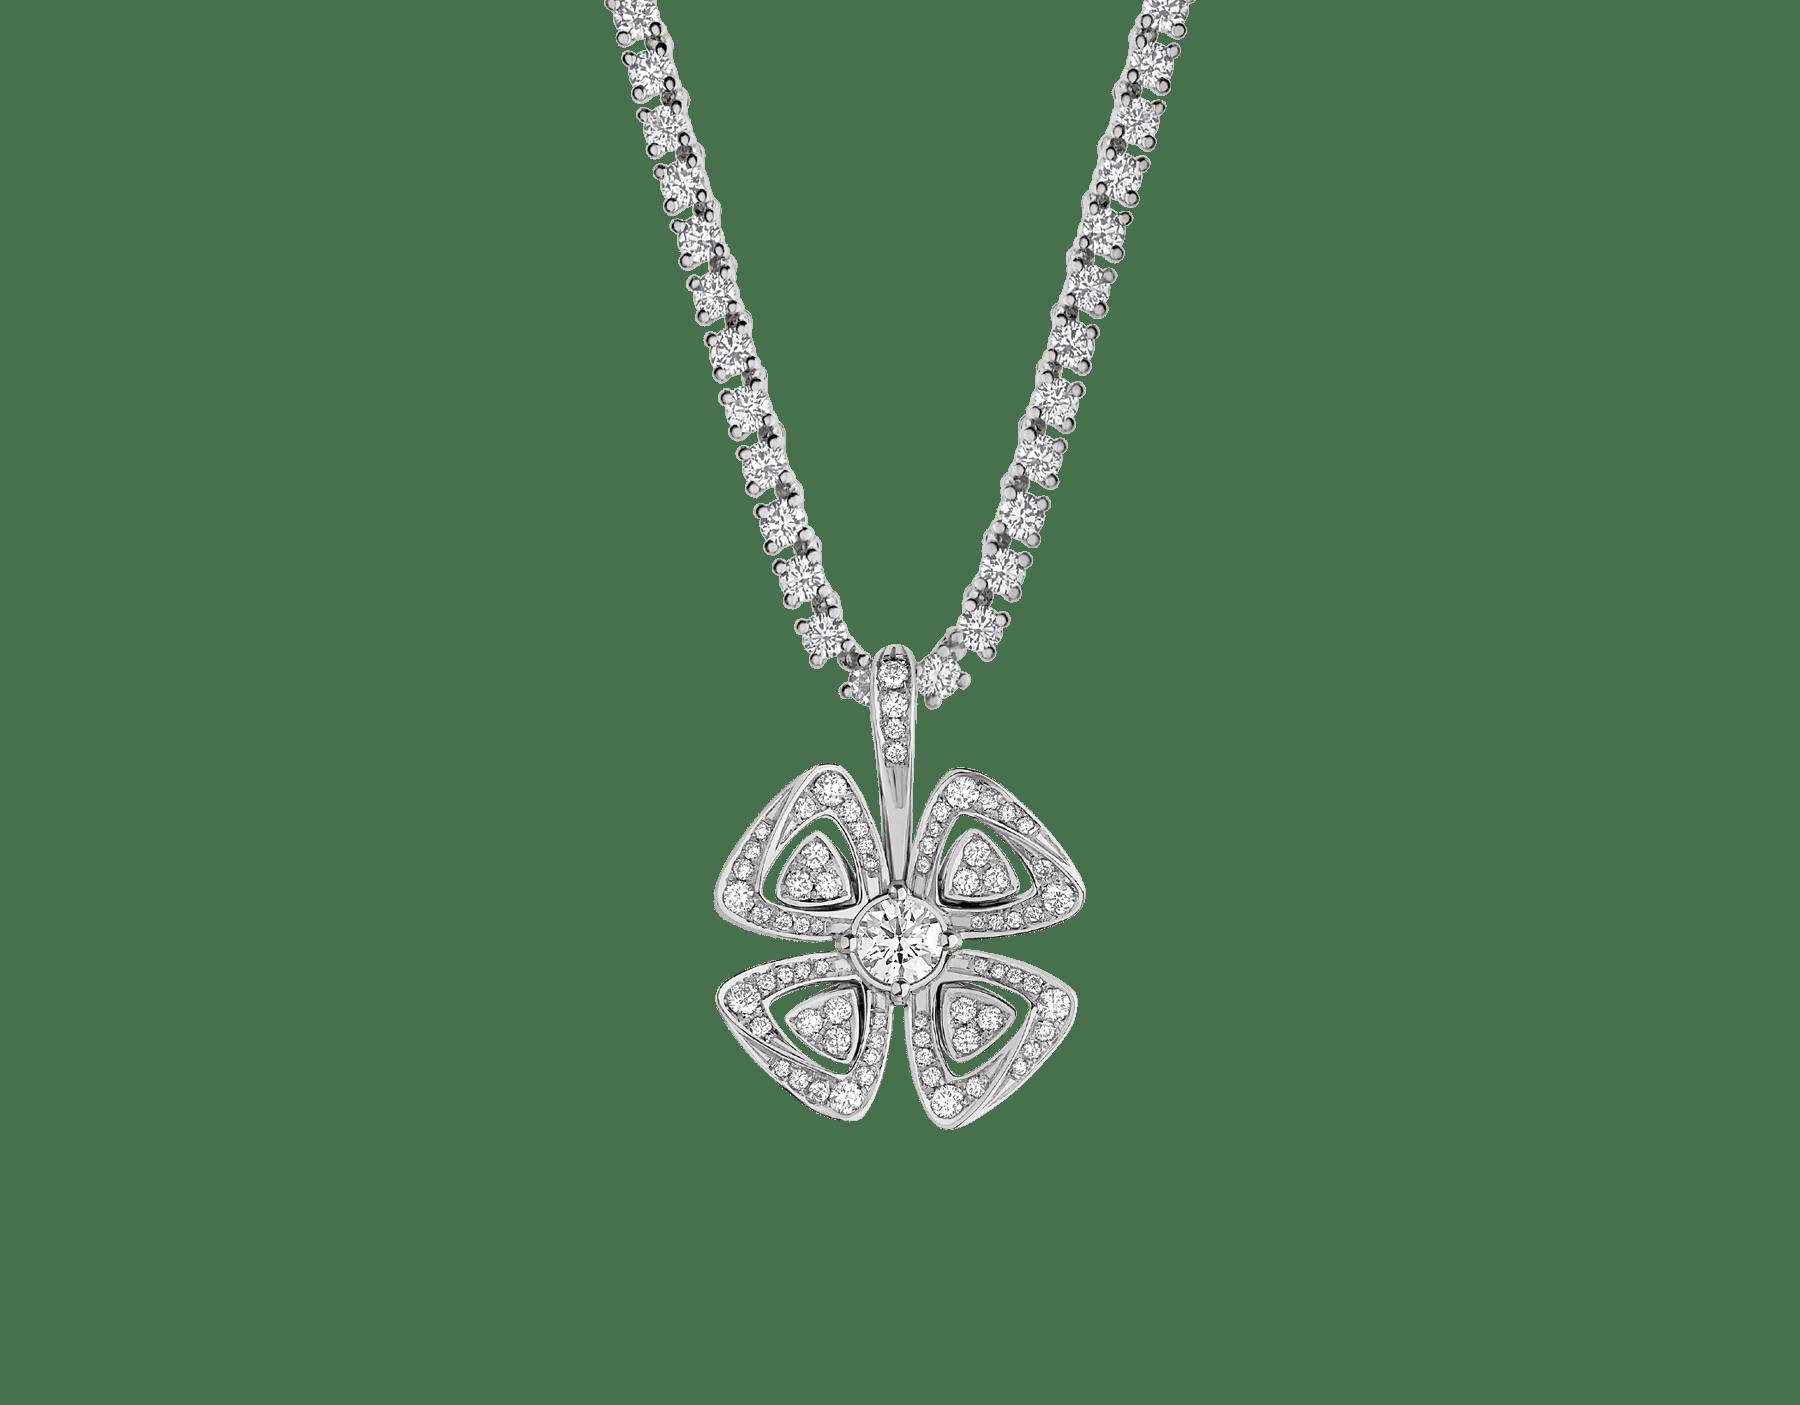 Fiorever 18 kt white gold convertible pendant necklace set with brilliant-cut diamonds (5.55 ct) and pavé diamonds (0.41 ct) 358351 image 1